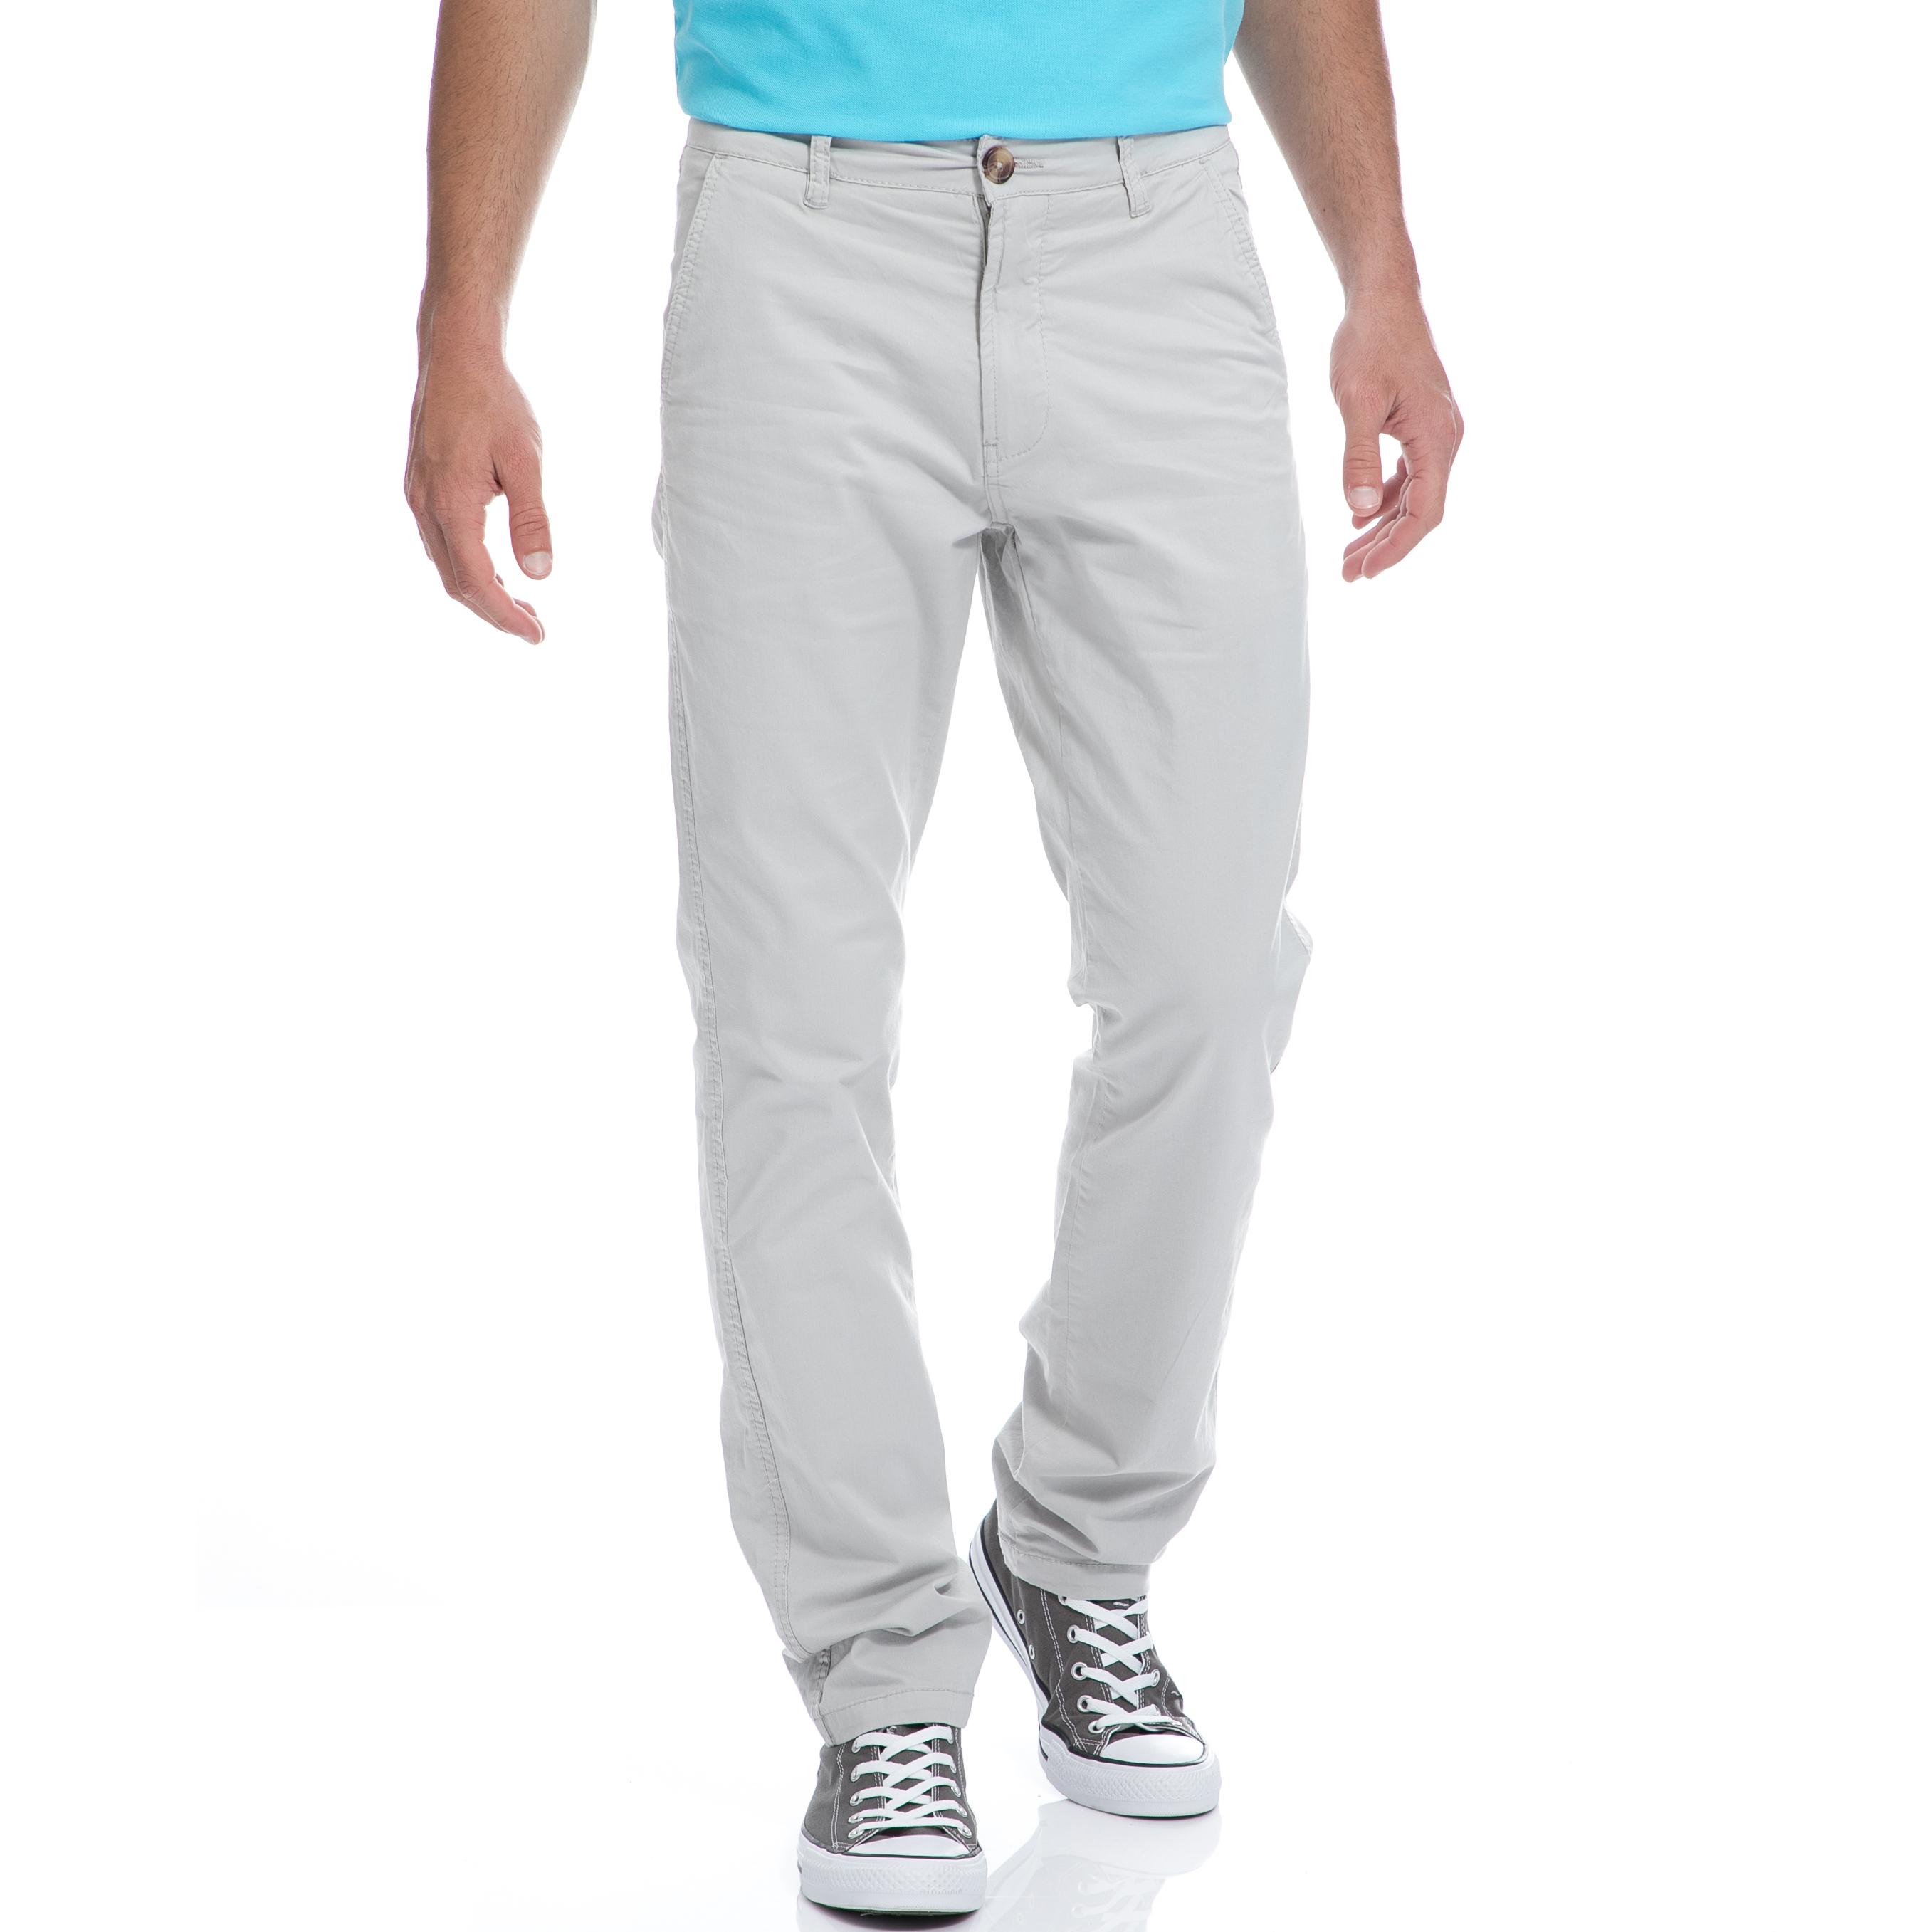 BATTERY - Ανδρικό παντελόνι Battery γκρι ανδρικά ρούχα παντελόνια chinos